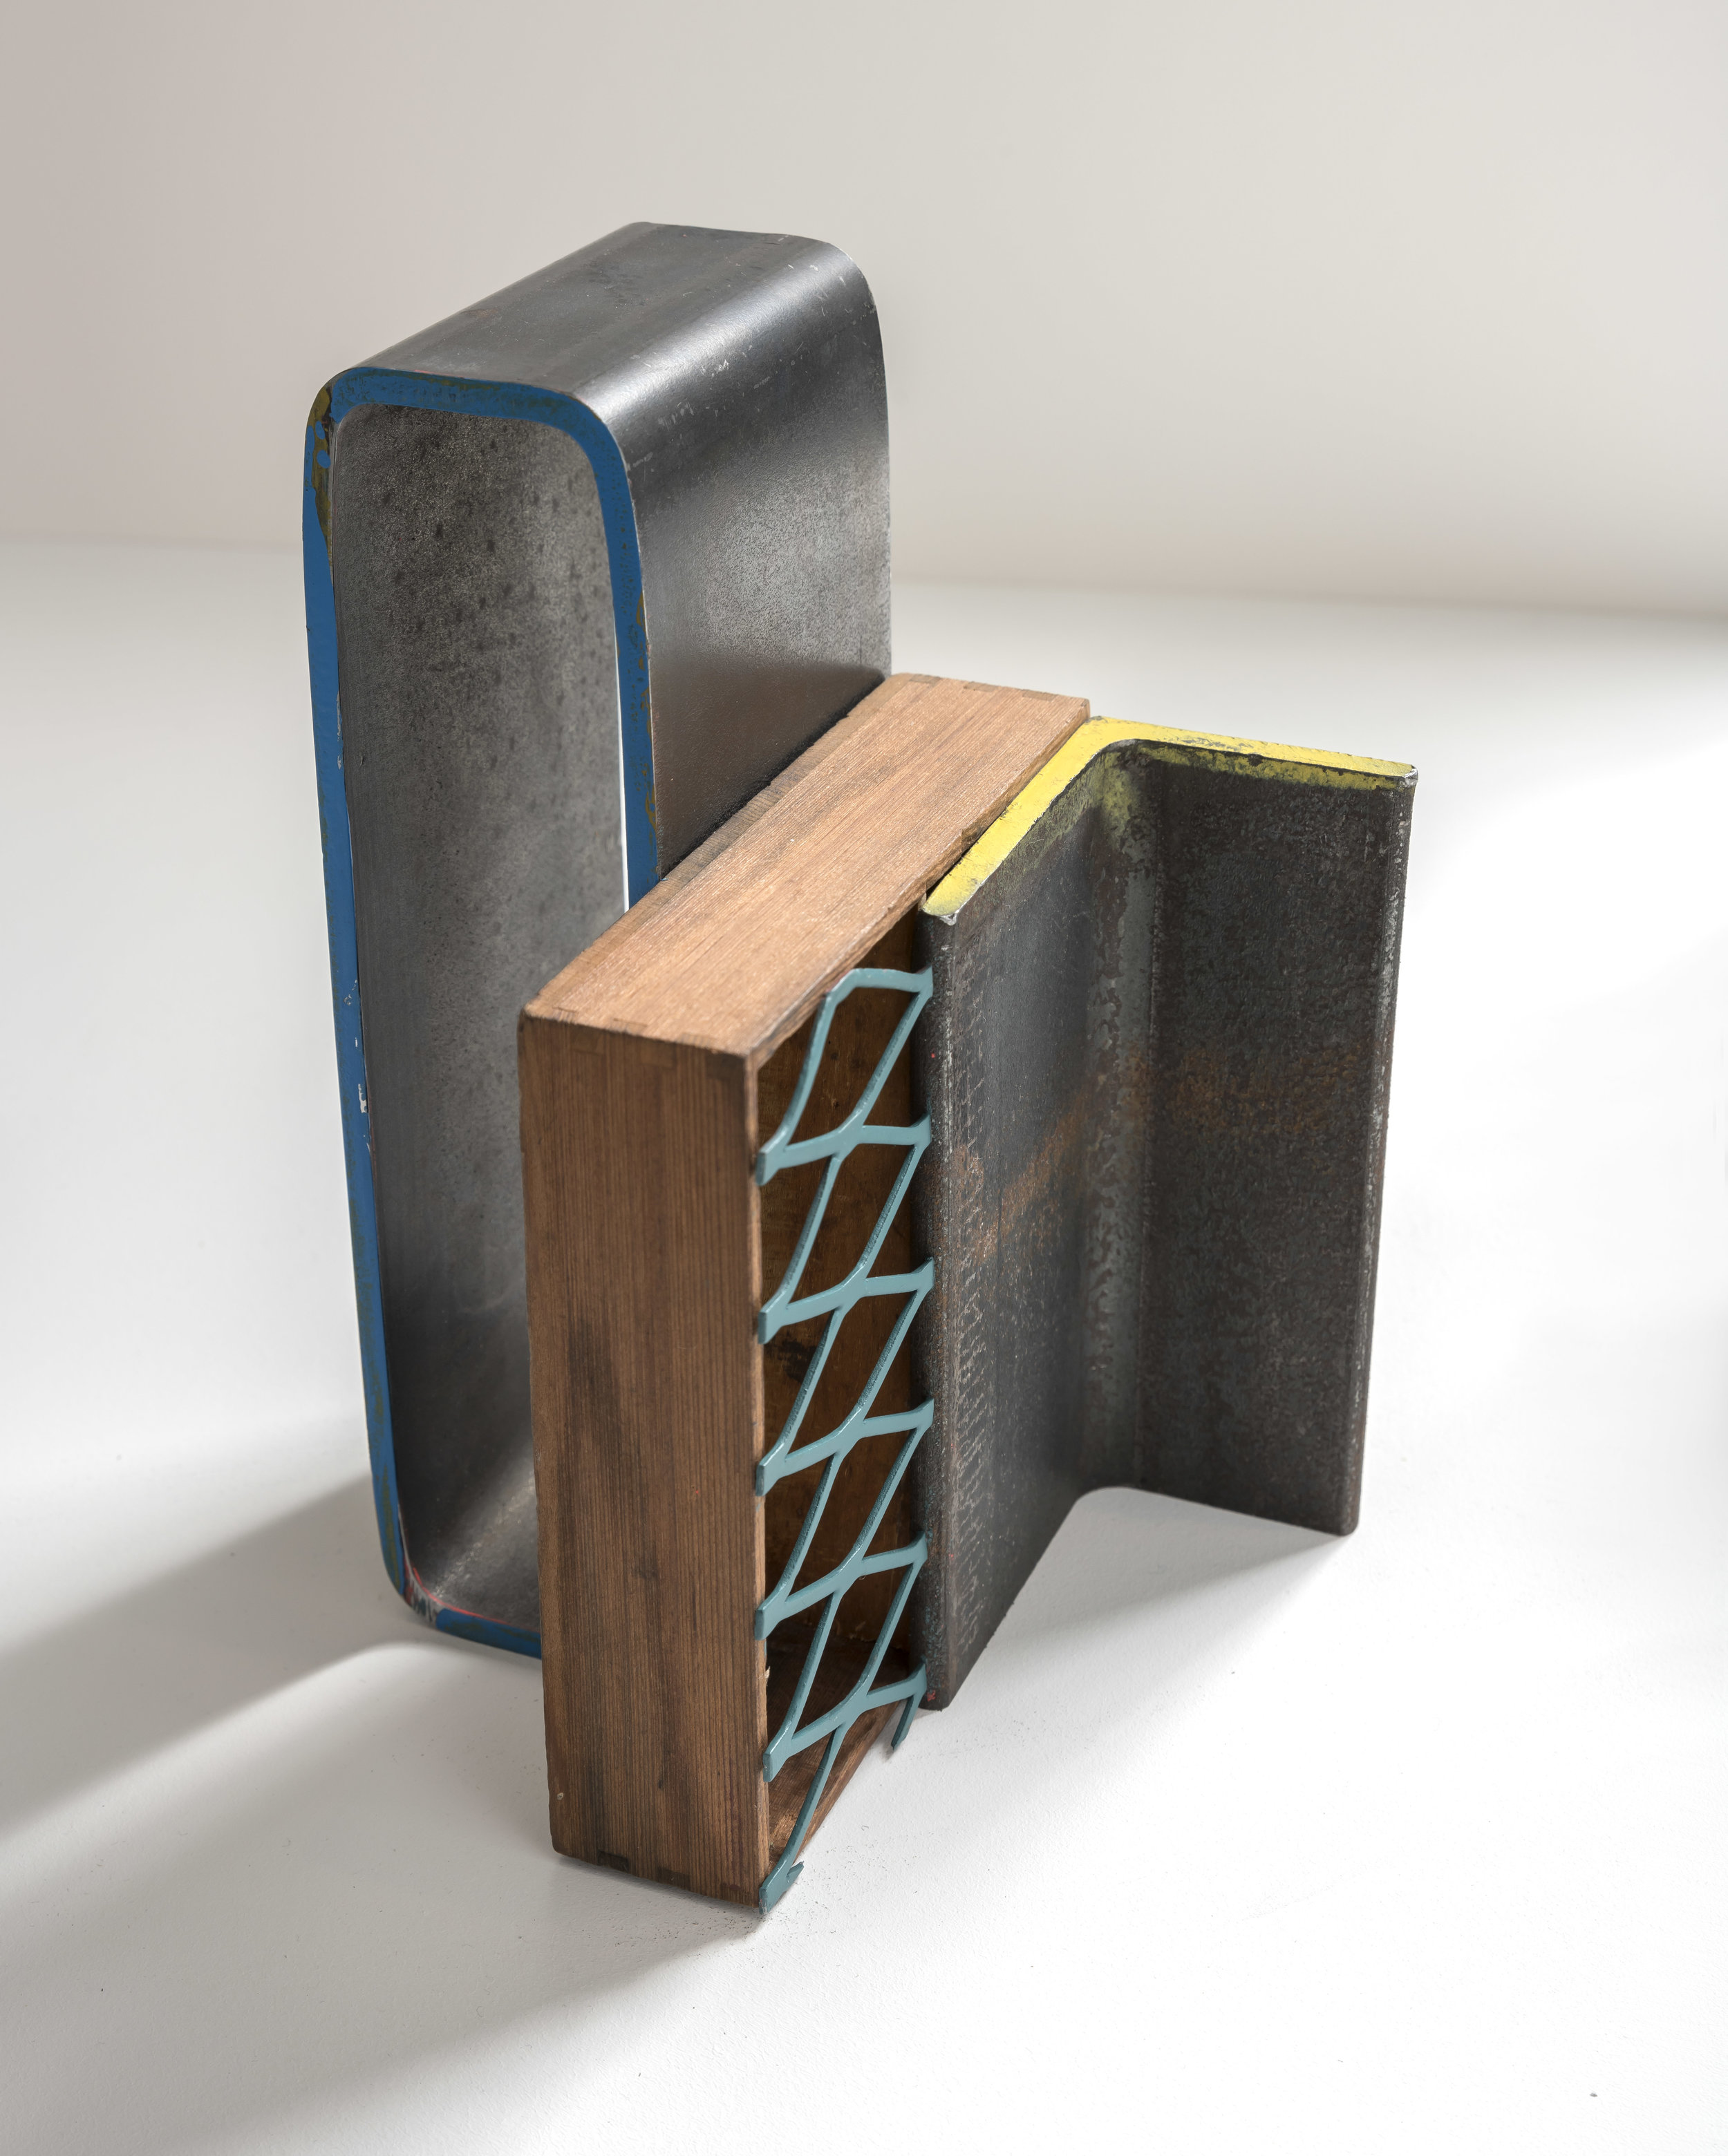 Assemblage ll, 2019  steel, wood, magnet, aerosol paint 5 1/2 x 8 x 5 3/8 inches; 14 x 20.3 x 13.7 centimeters  $3,000.00